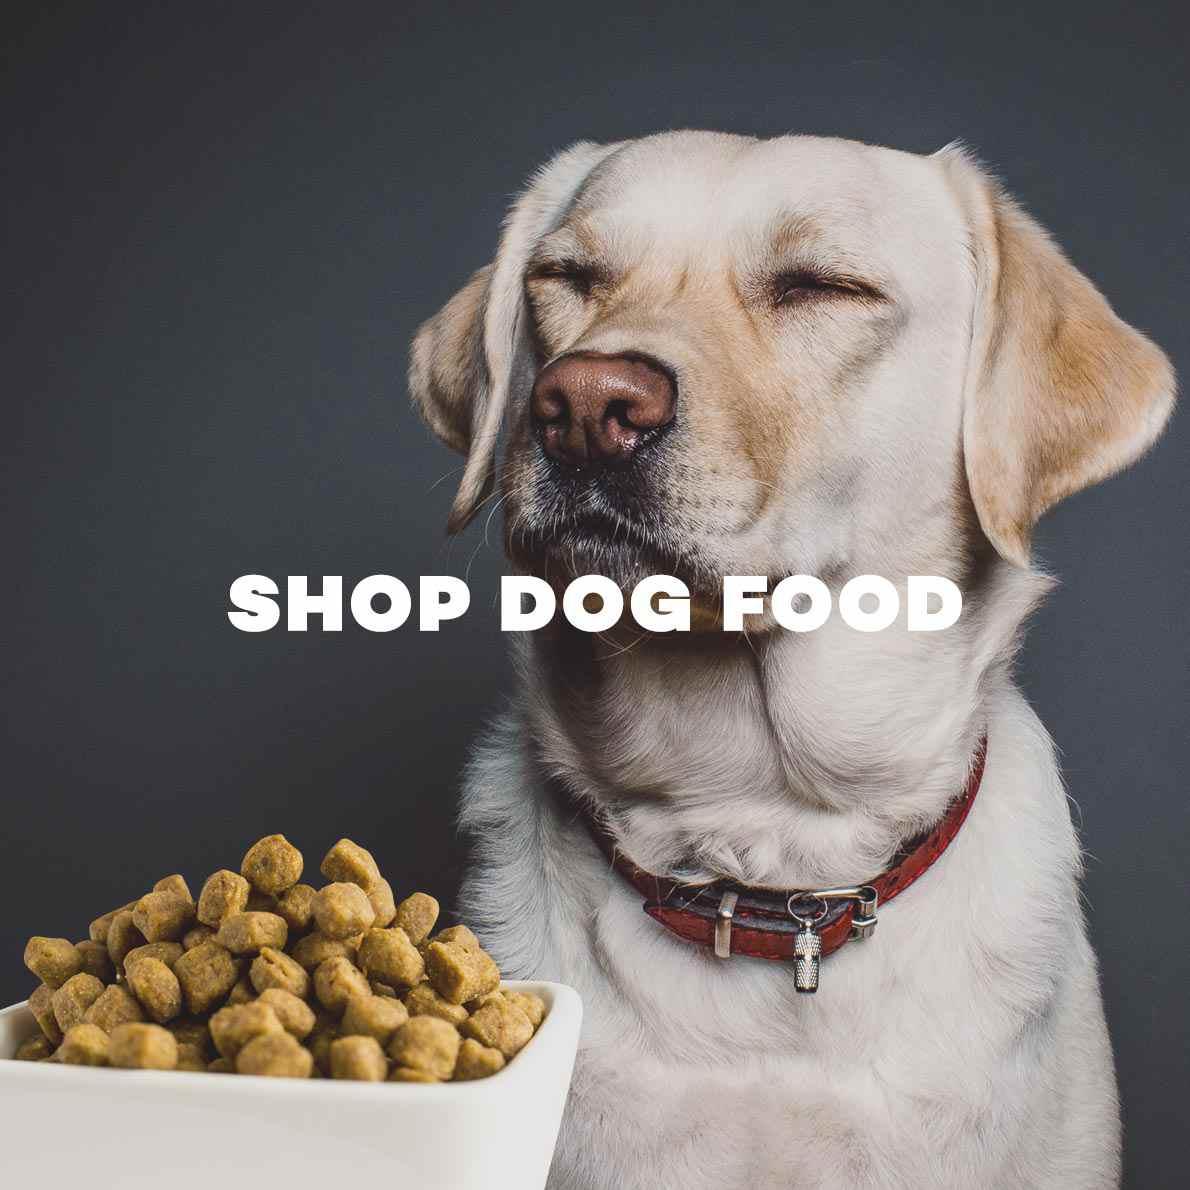 Crib bumper for sale philippines - Dog Crib For Sale Philippines Pet Shop Online Buy Dog Food Pet Supplies Leash Feeding